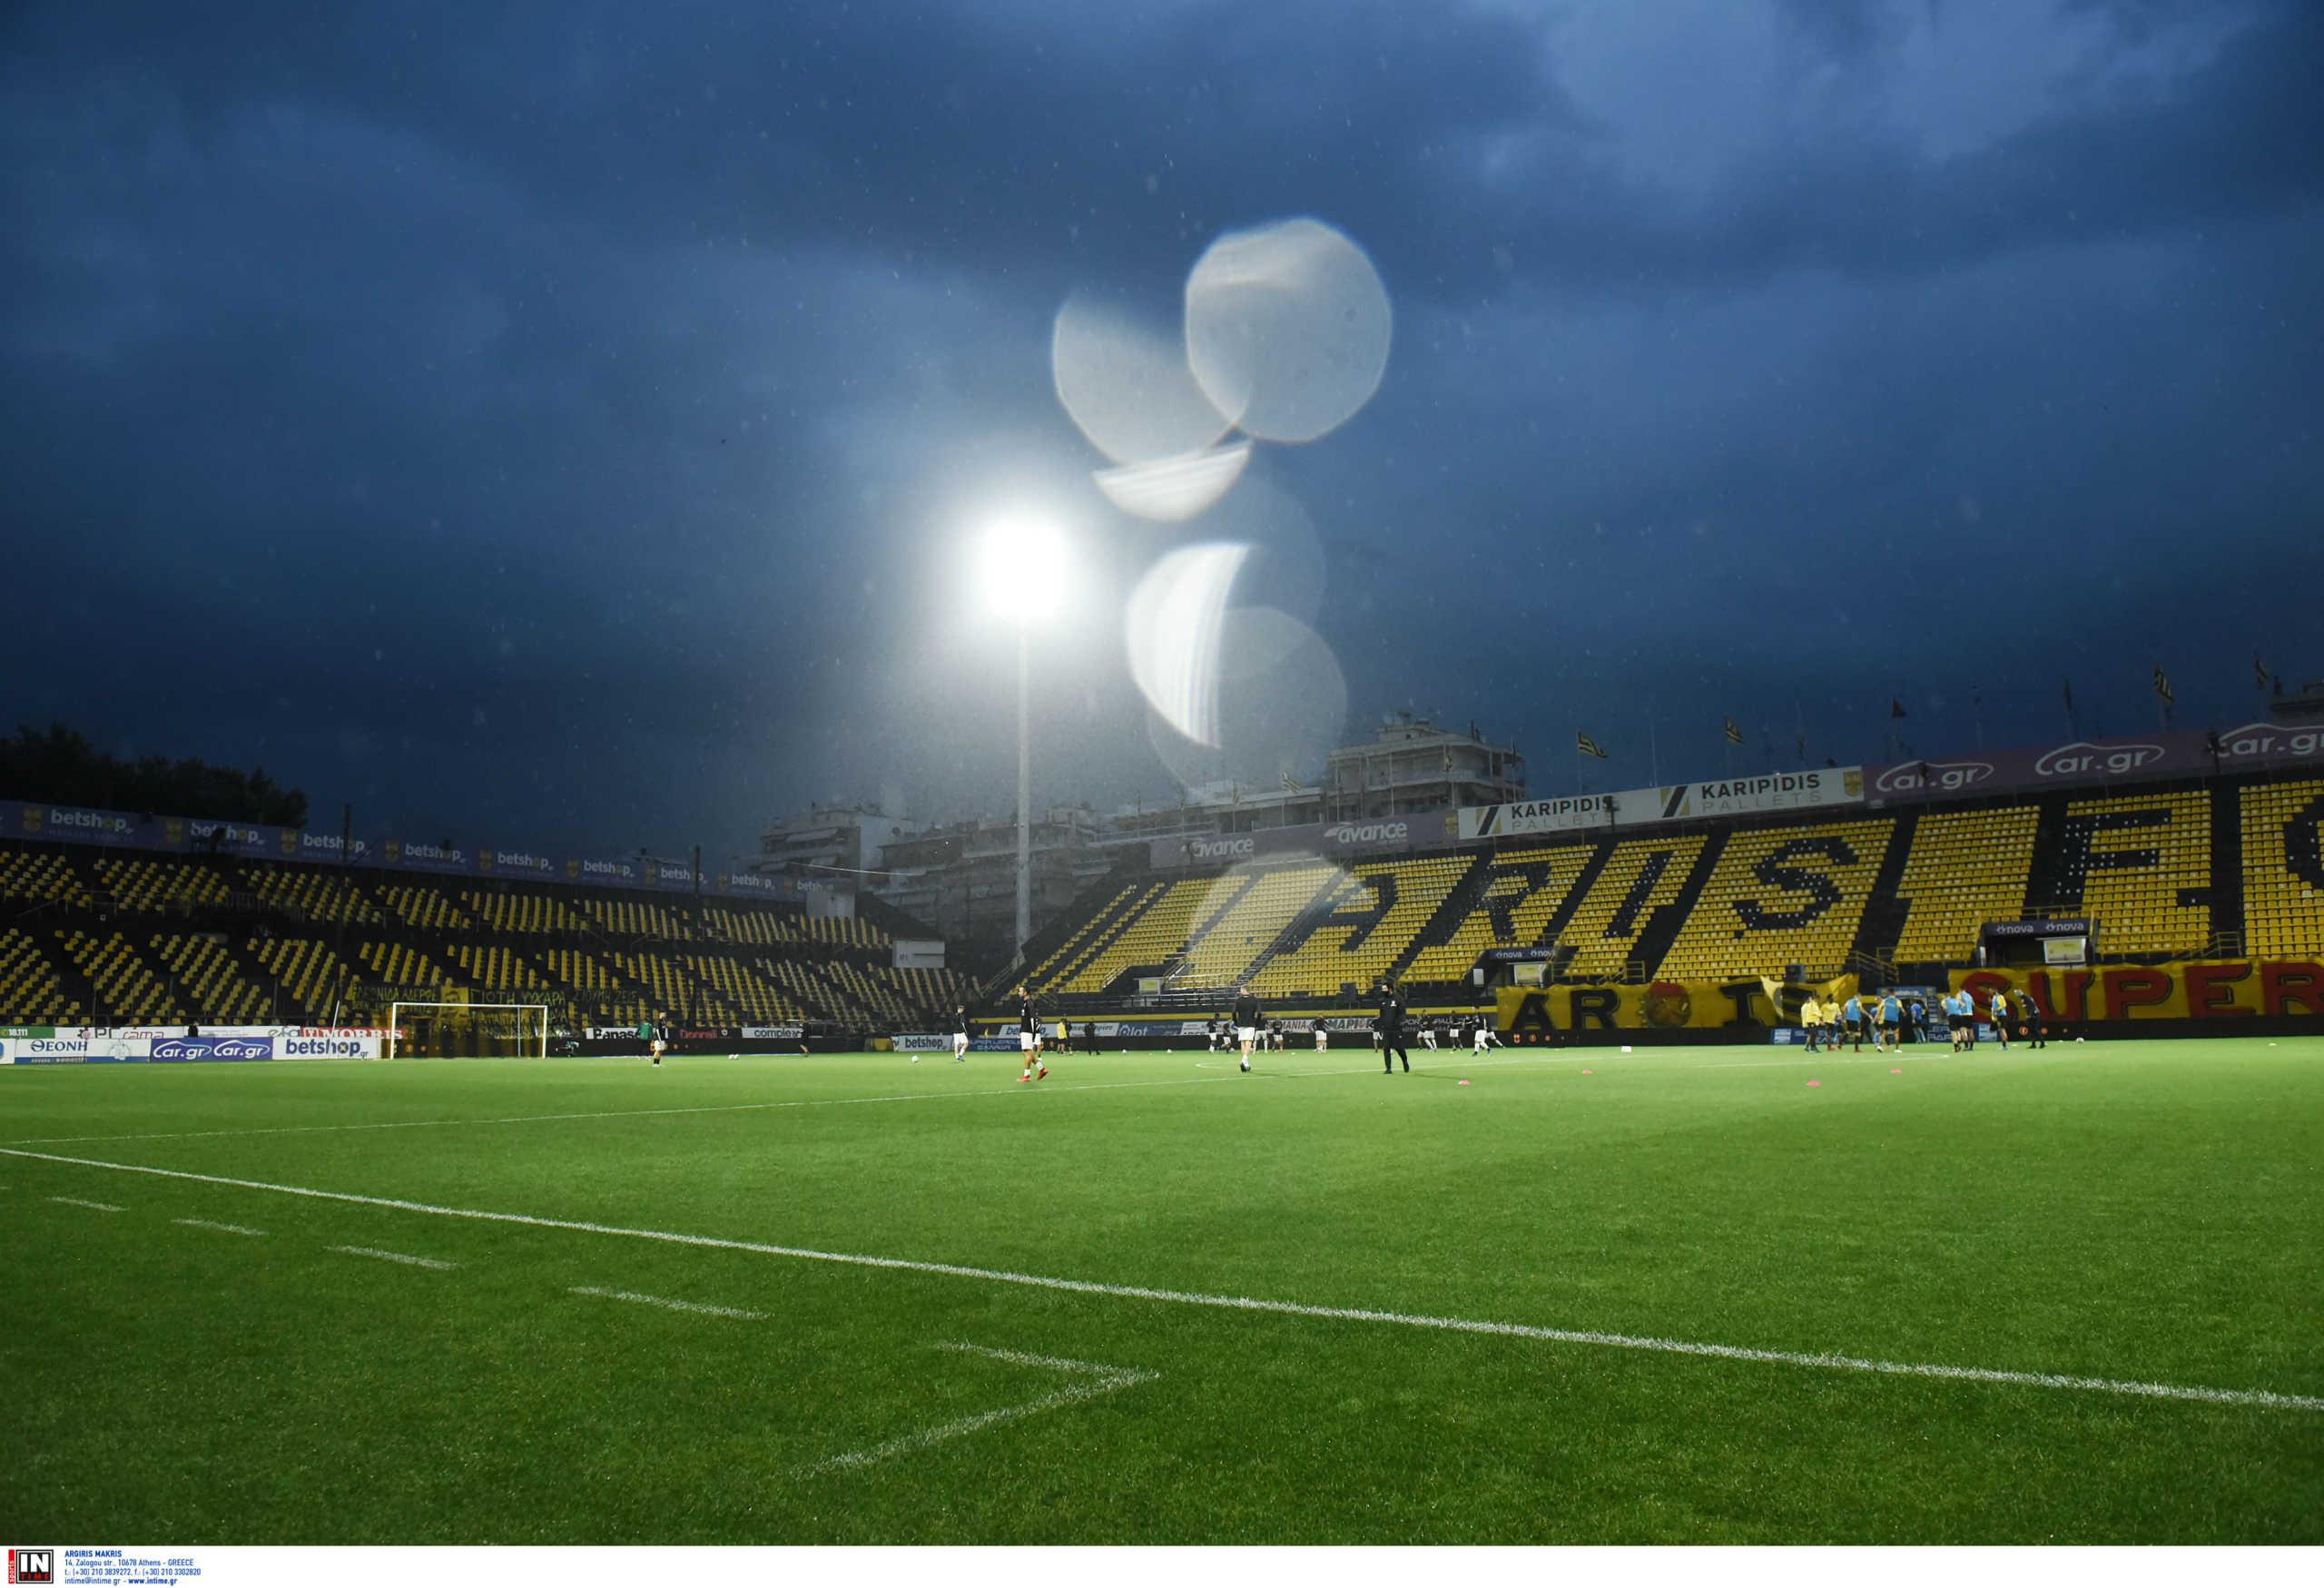 Superleague: Στις «φλόγες» η Θεσσαλονίκη – Επικίνδυνες έξοδοι για Ολυμπιακό και ΑΕΚ